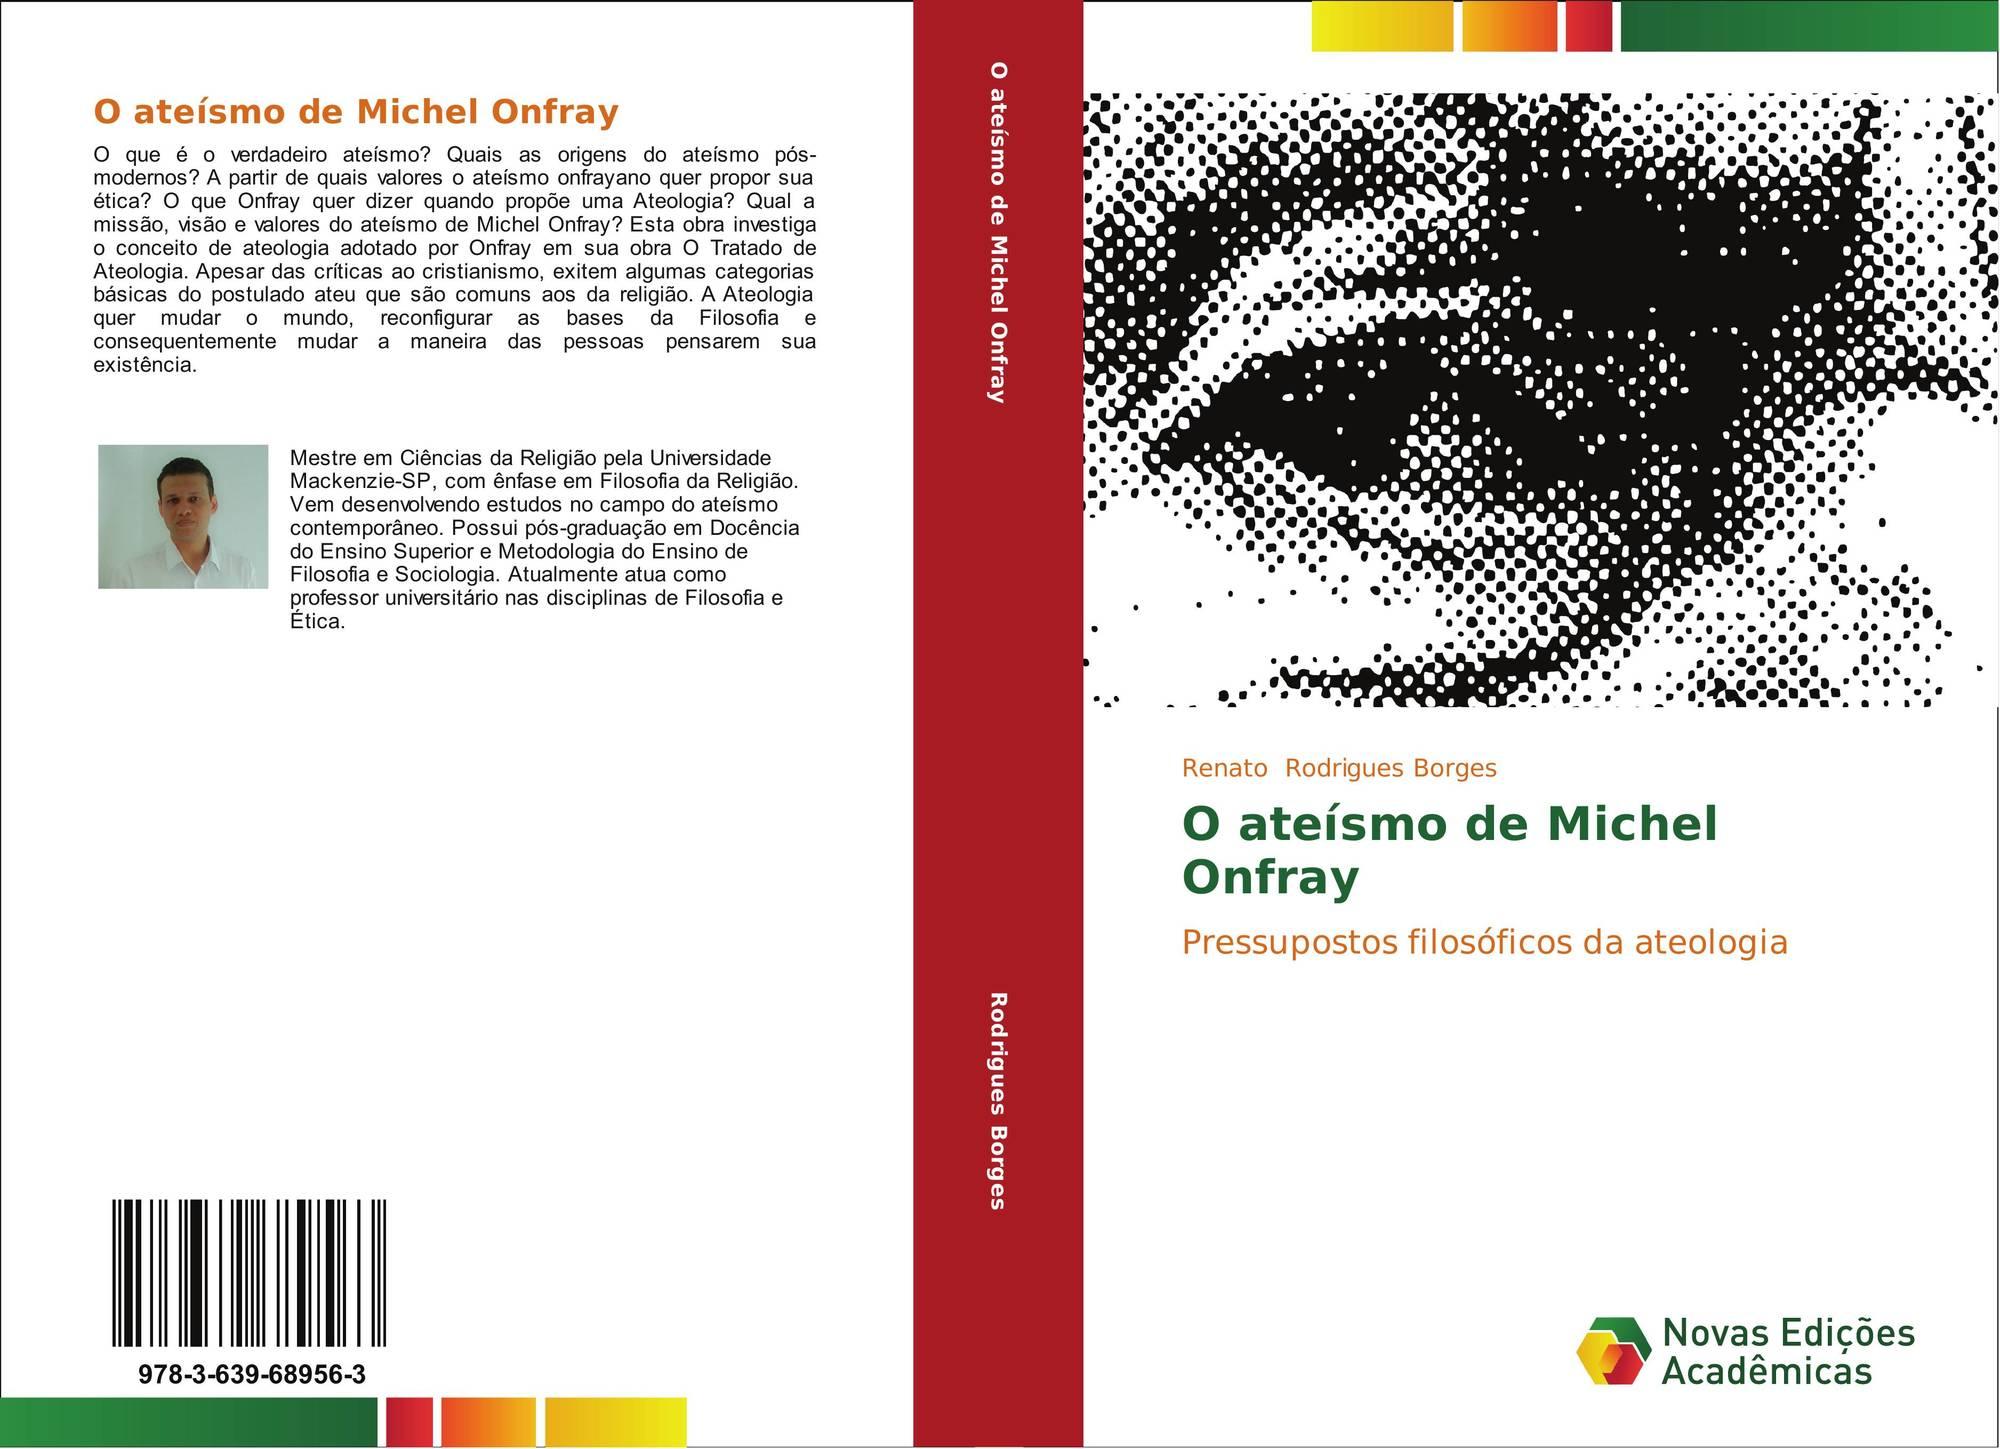 O ateísmo de Michel Onfray